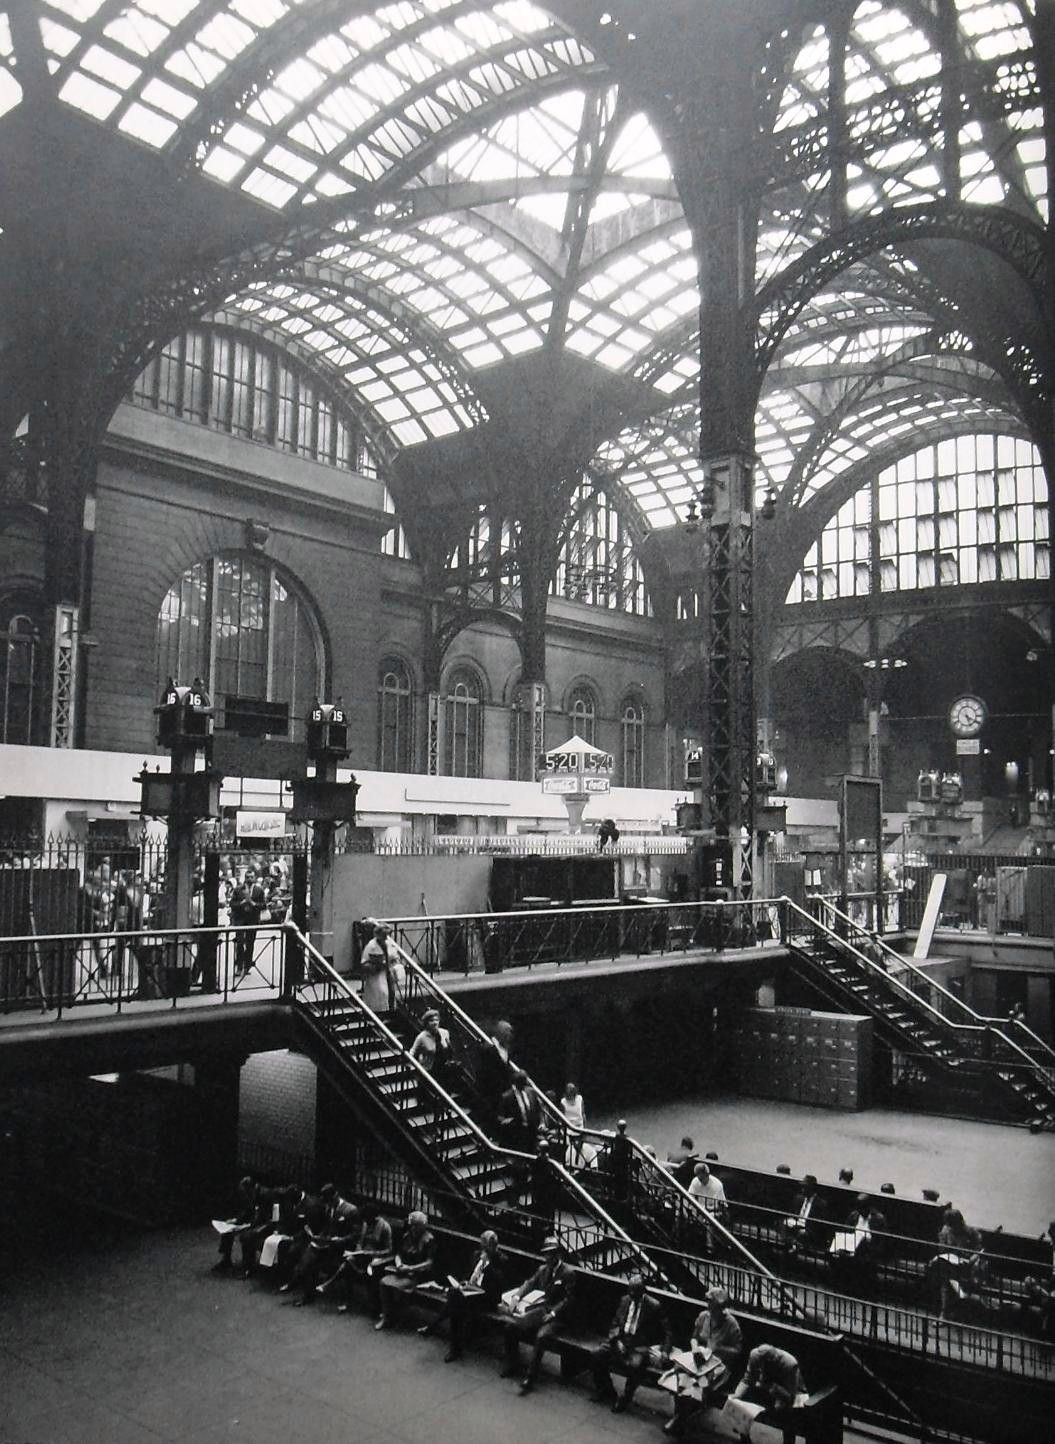 New York City Urban Garden: New York City 1960's, Pennsylvania Station.